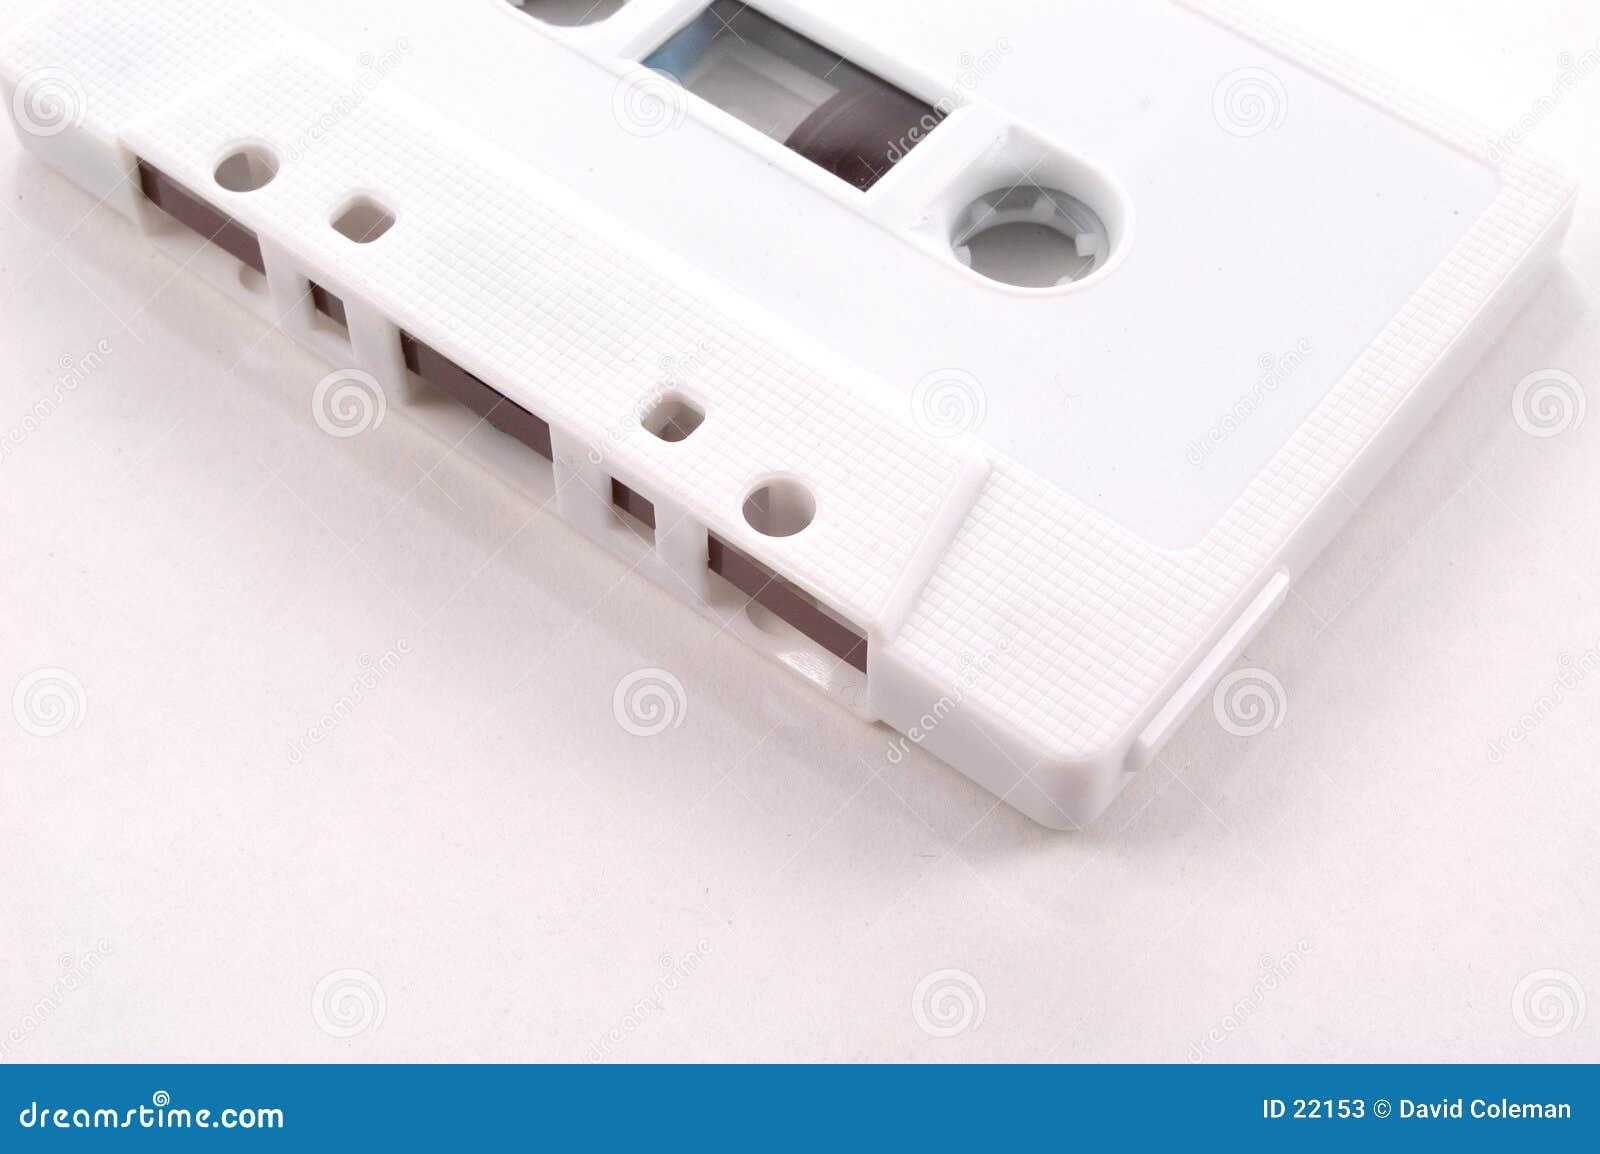 Cassete de banda magnética - vista parcial